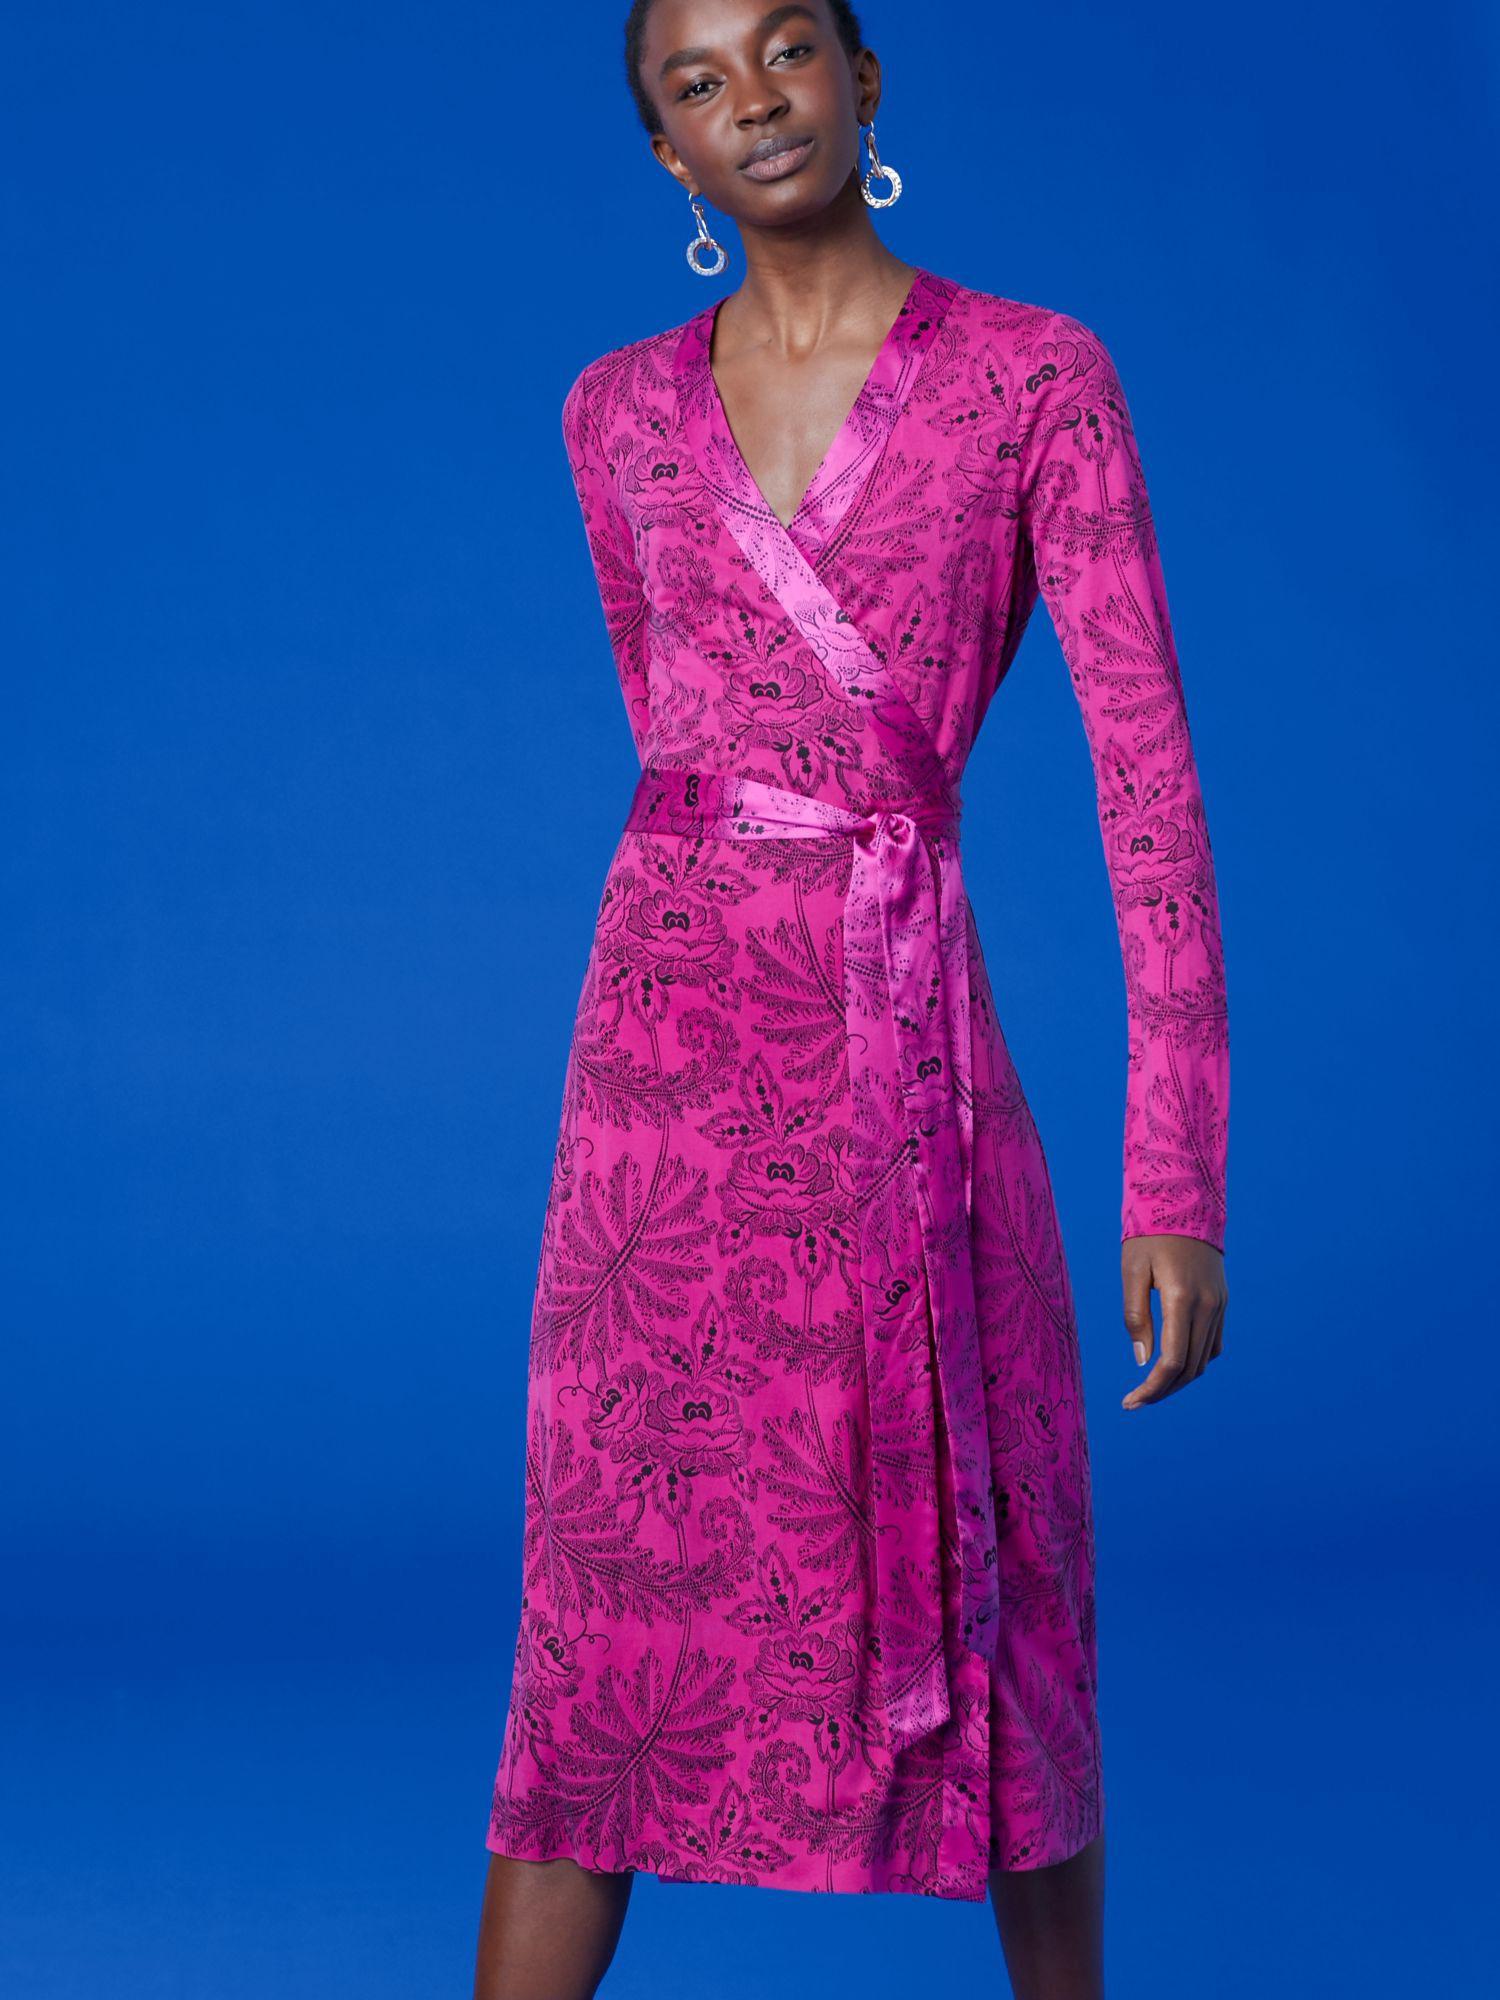 1d7b308ae8754 Diane Von Furstenberg Dvf Cybil Silk Jersey Banded Wrap Dress - Ullman  Ribbon Pink 12